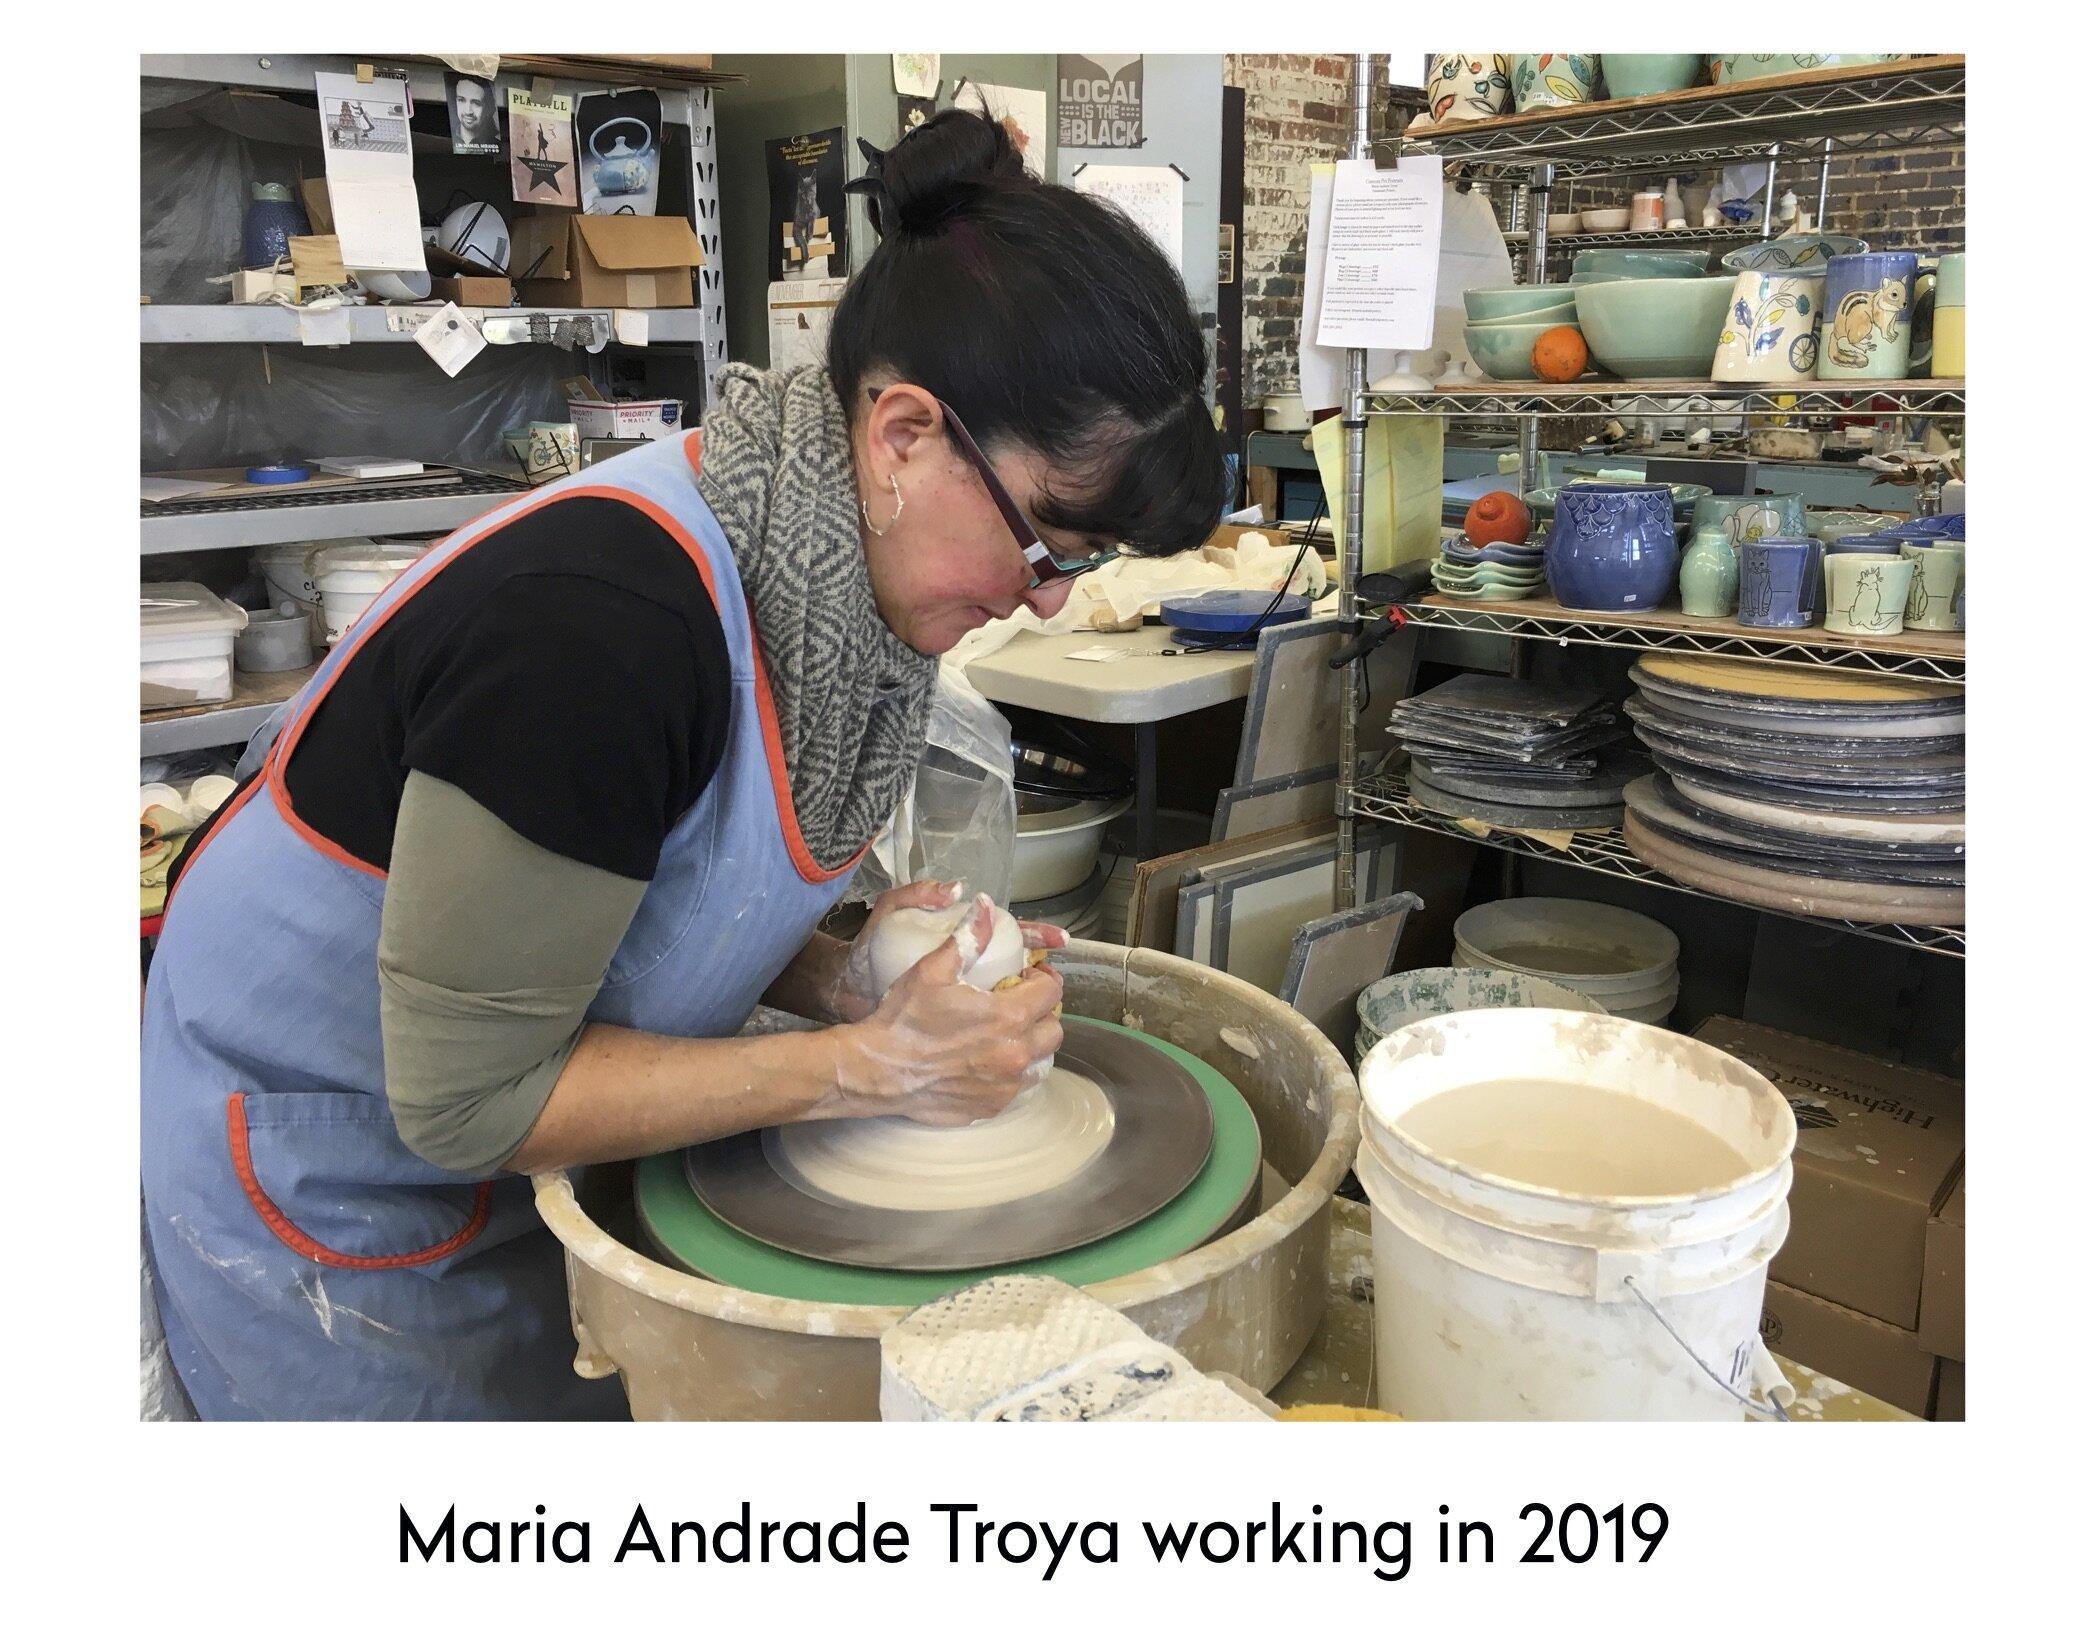 maria in studio 2019.jpg